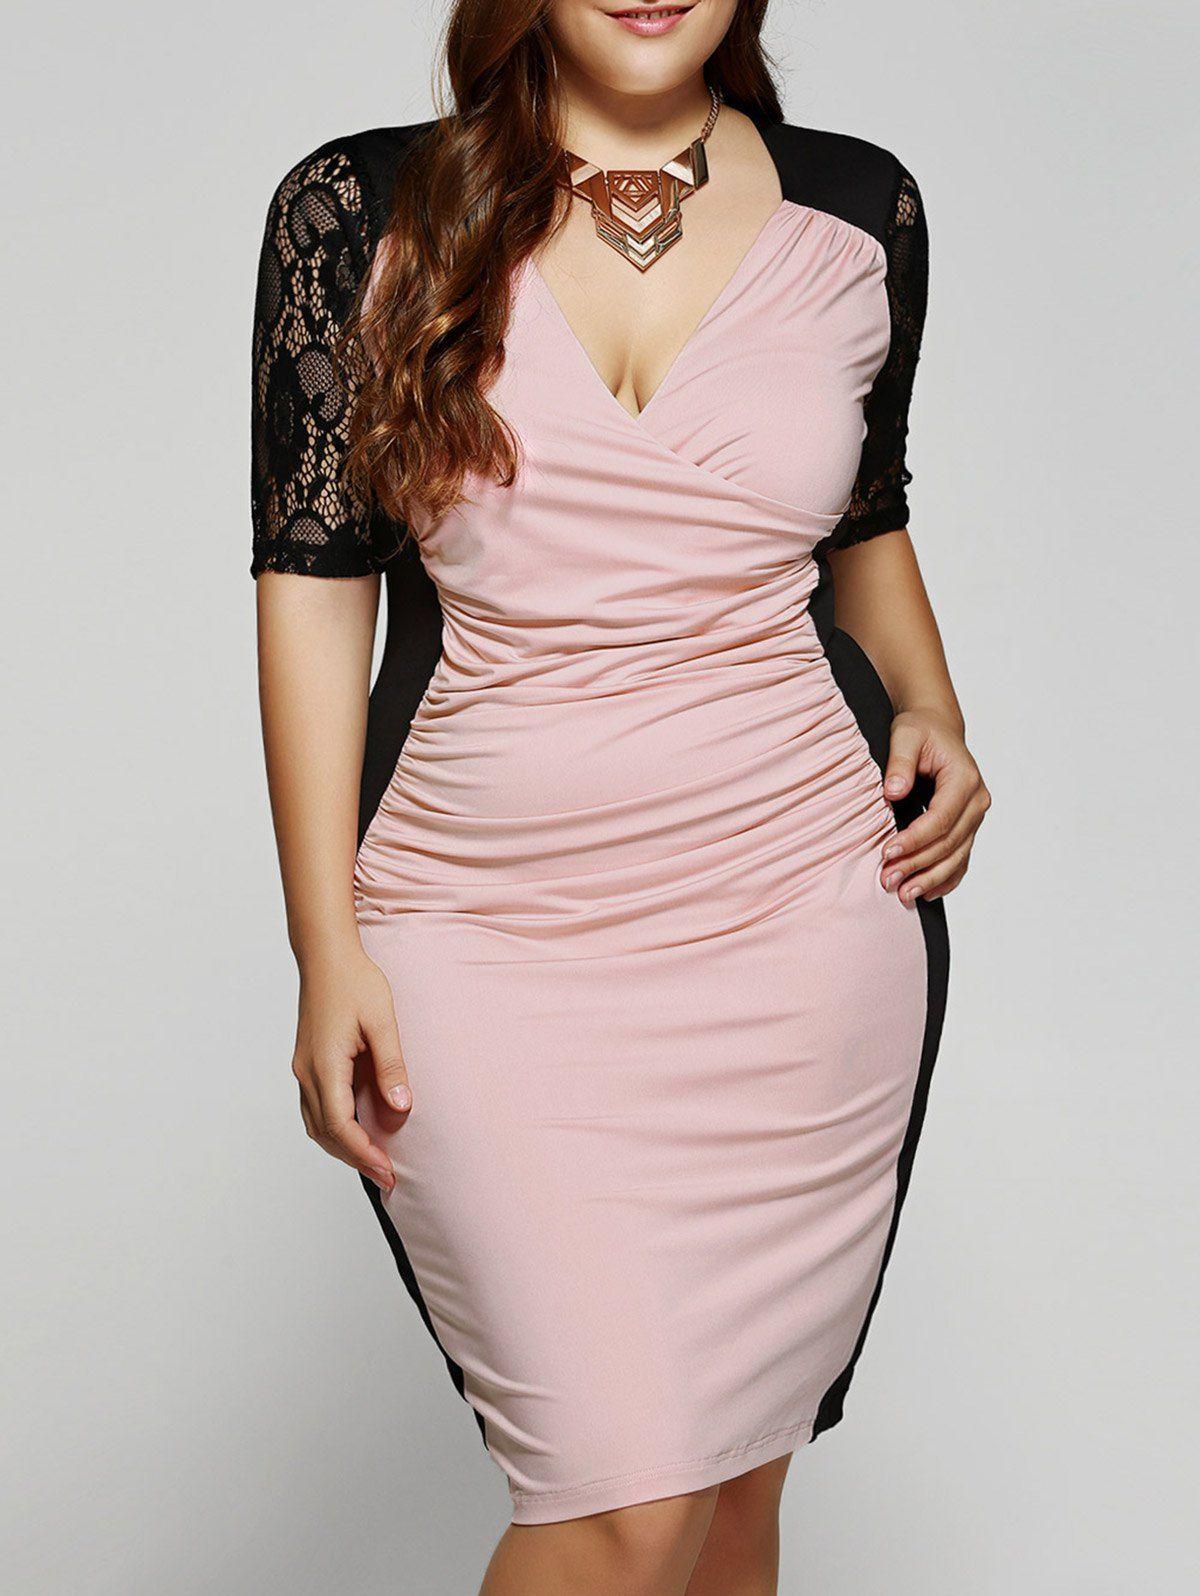 f035650ba769 Plus Size Chic V-Neck 1 2 Sleeves Splice Lace Dress